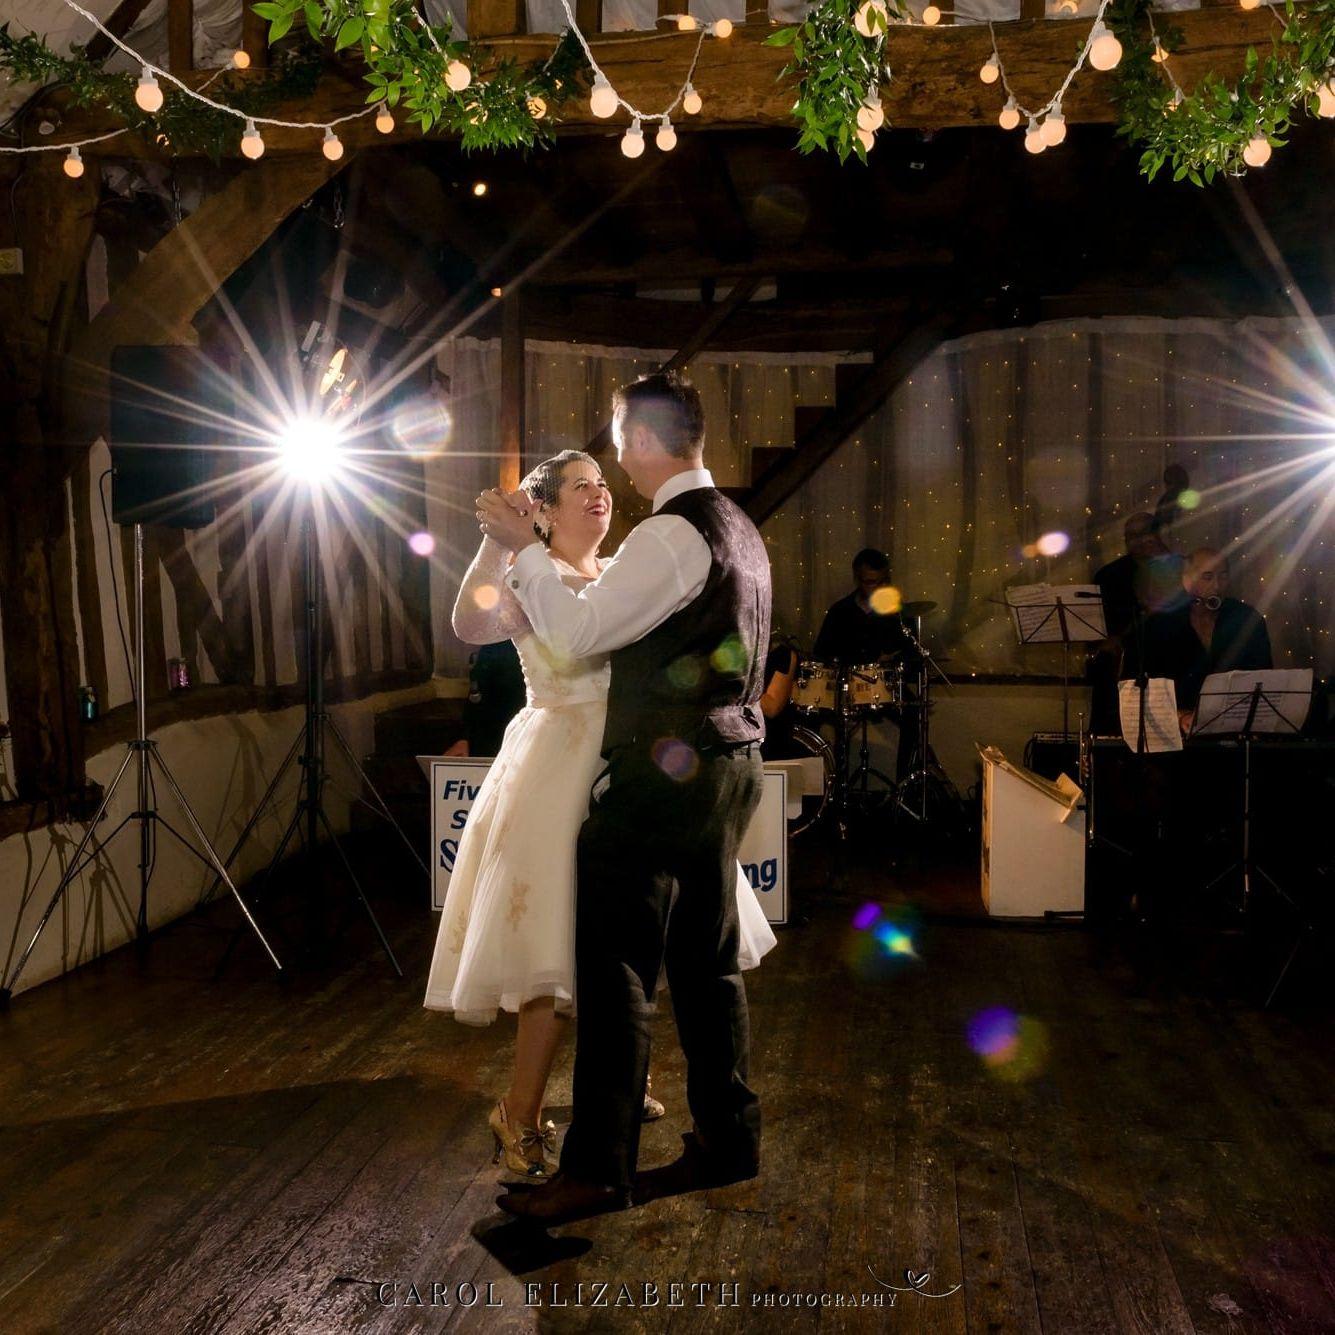 Old Luxters Barn wedding photography